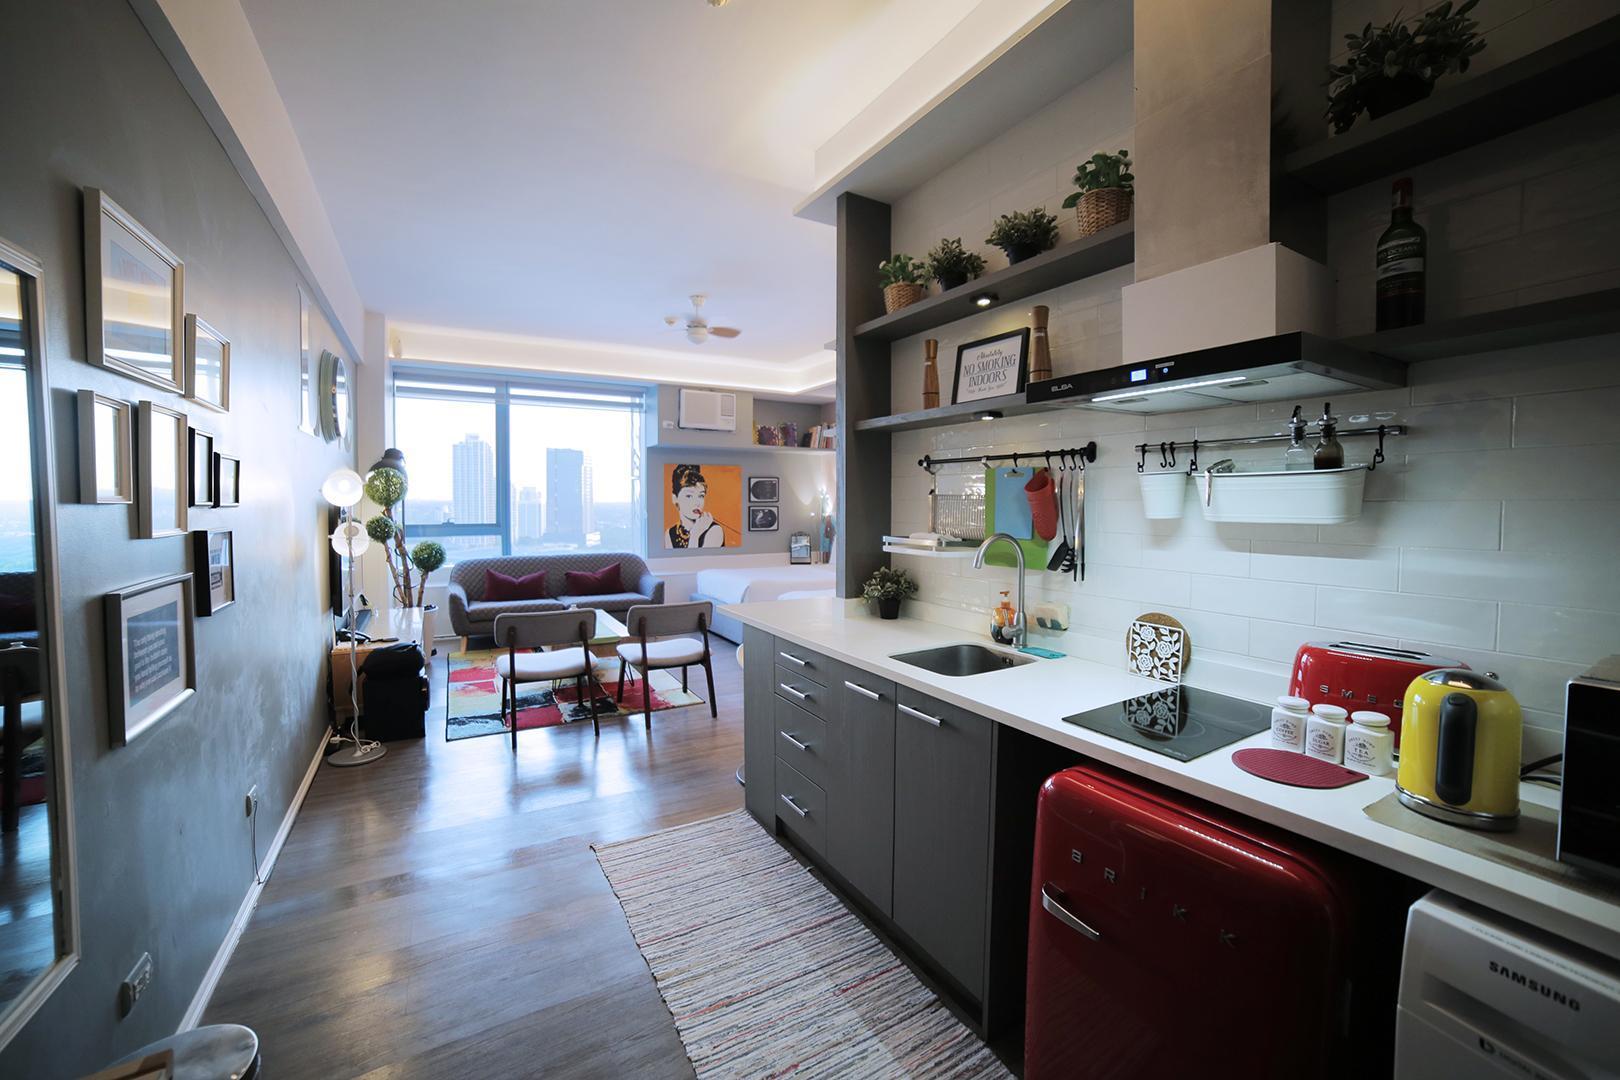 Posh Entrata Condo Suite With Panoramic City View